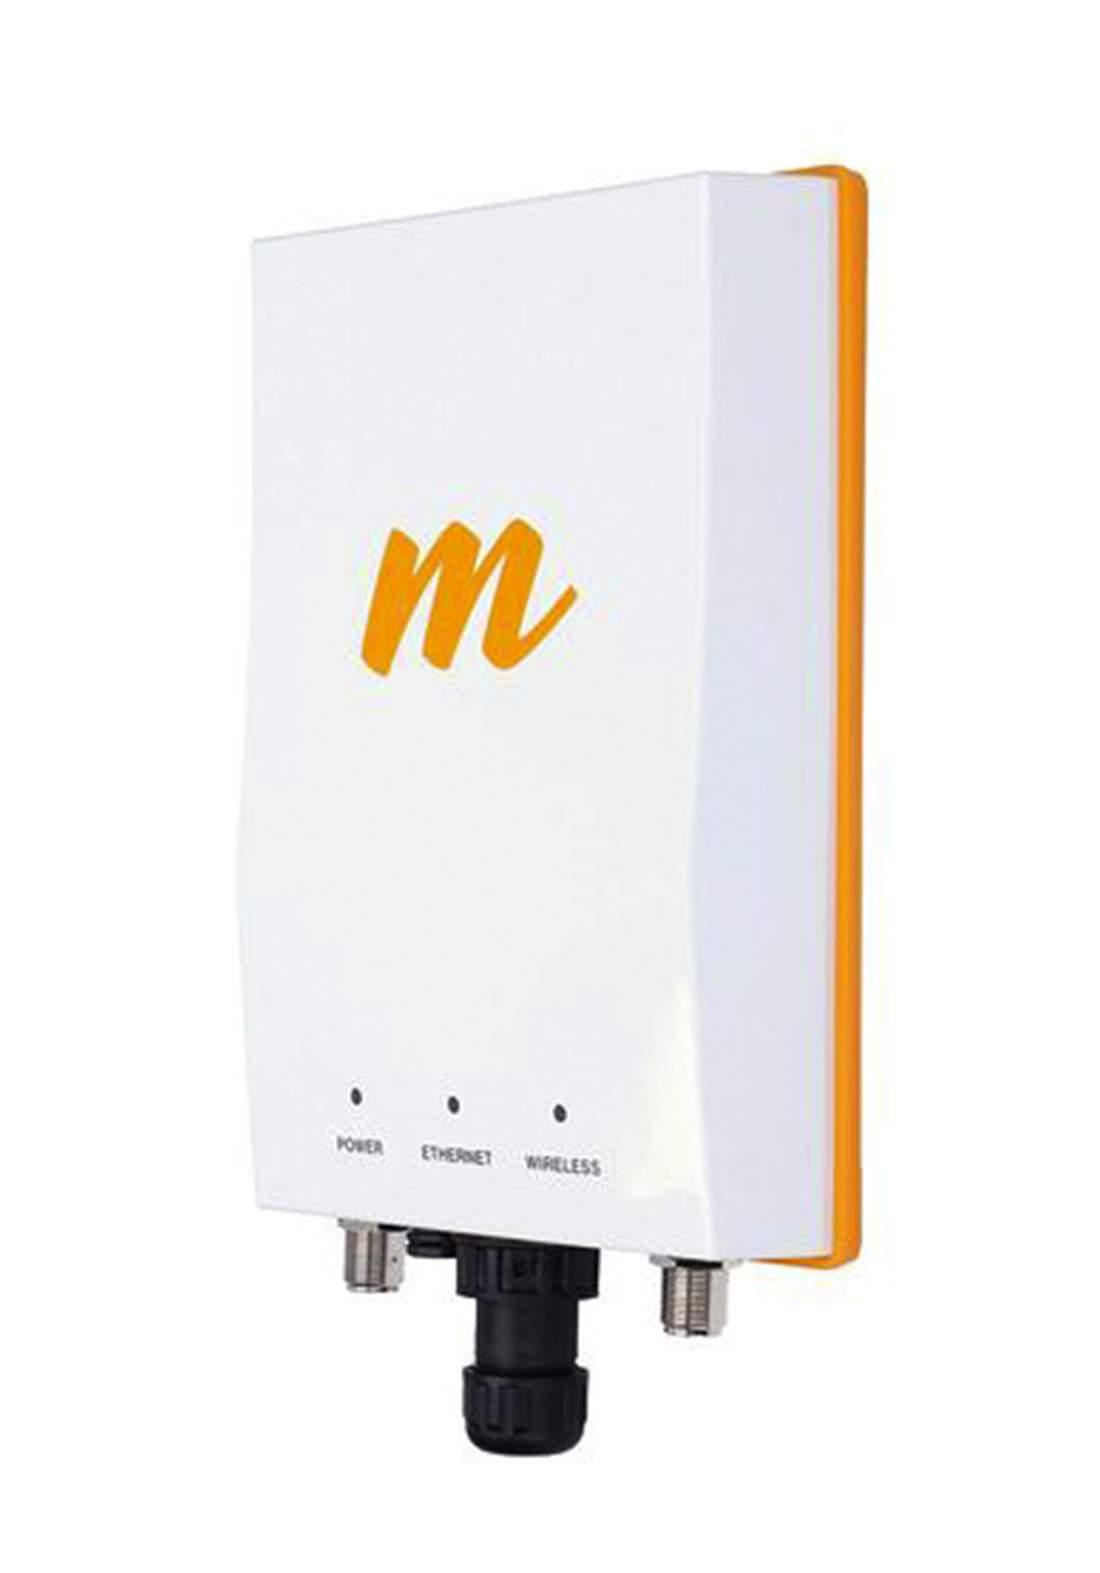 Mimosa B5C Connectorized Backhaul - White